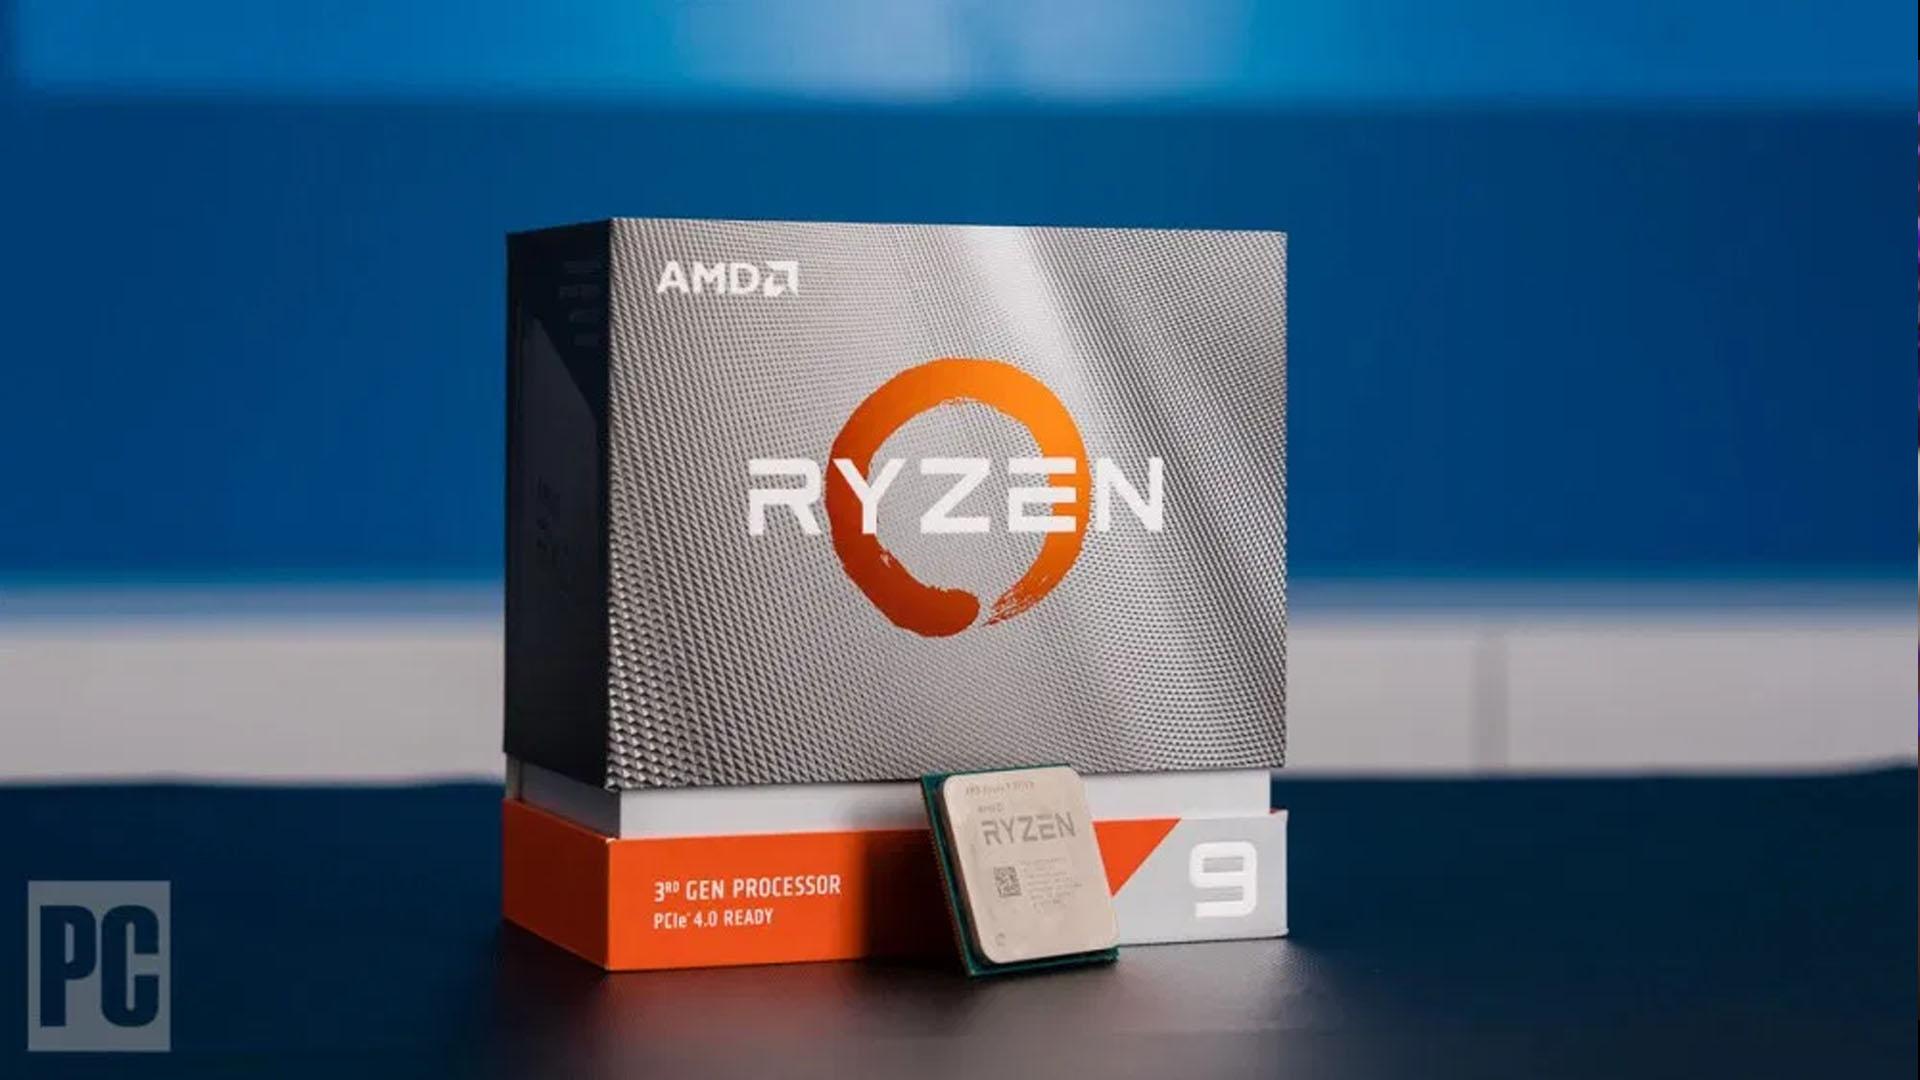 Ryzen 9 3950X - الفوارق بين معالجات AMD Ryzen X وAMD Ryzen XT تتلخص في الأتي